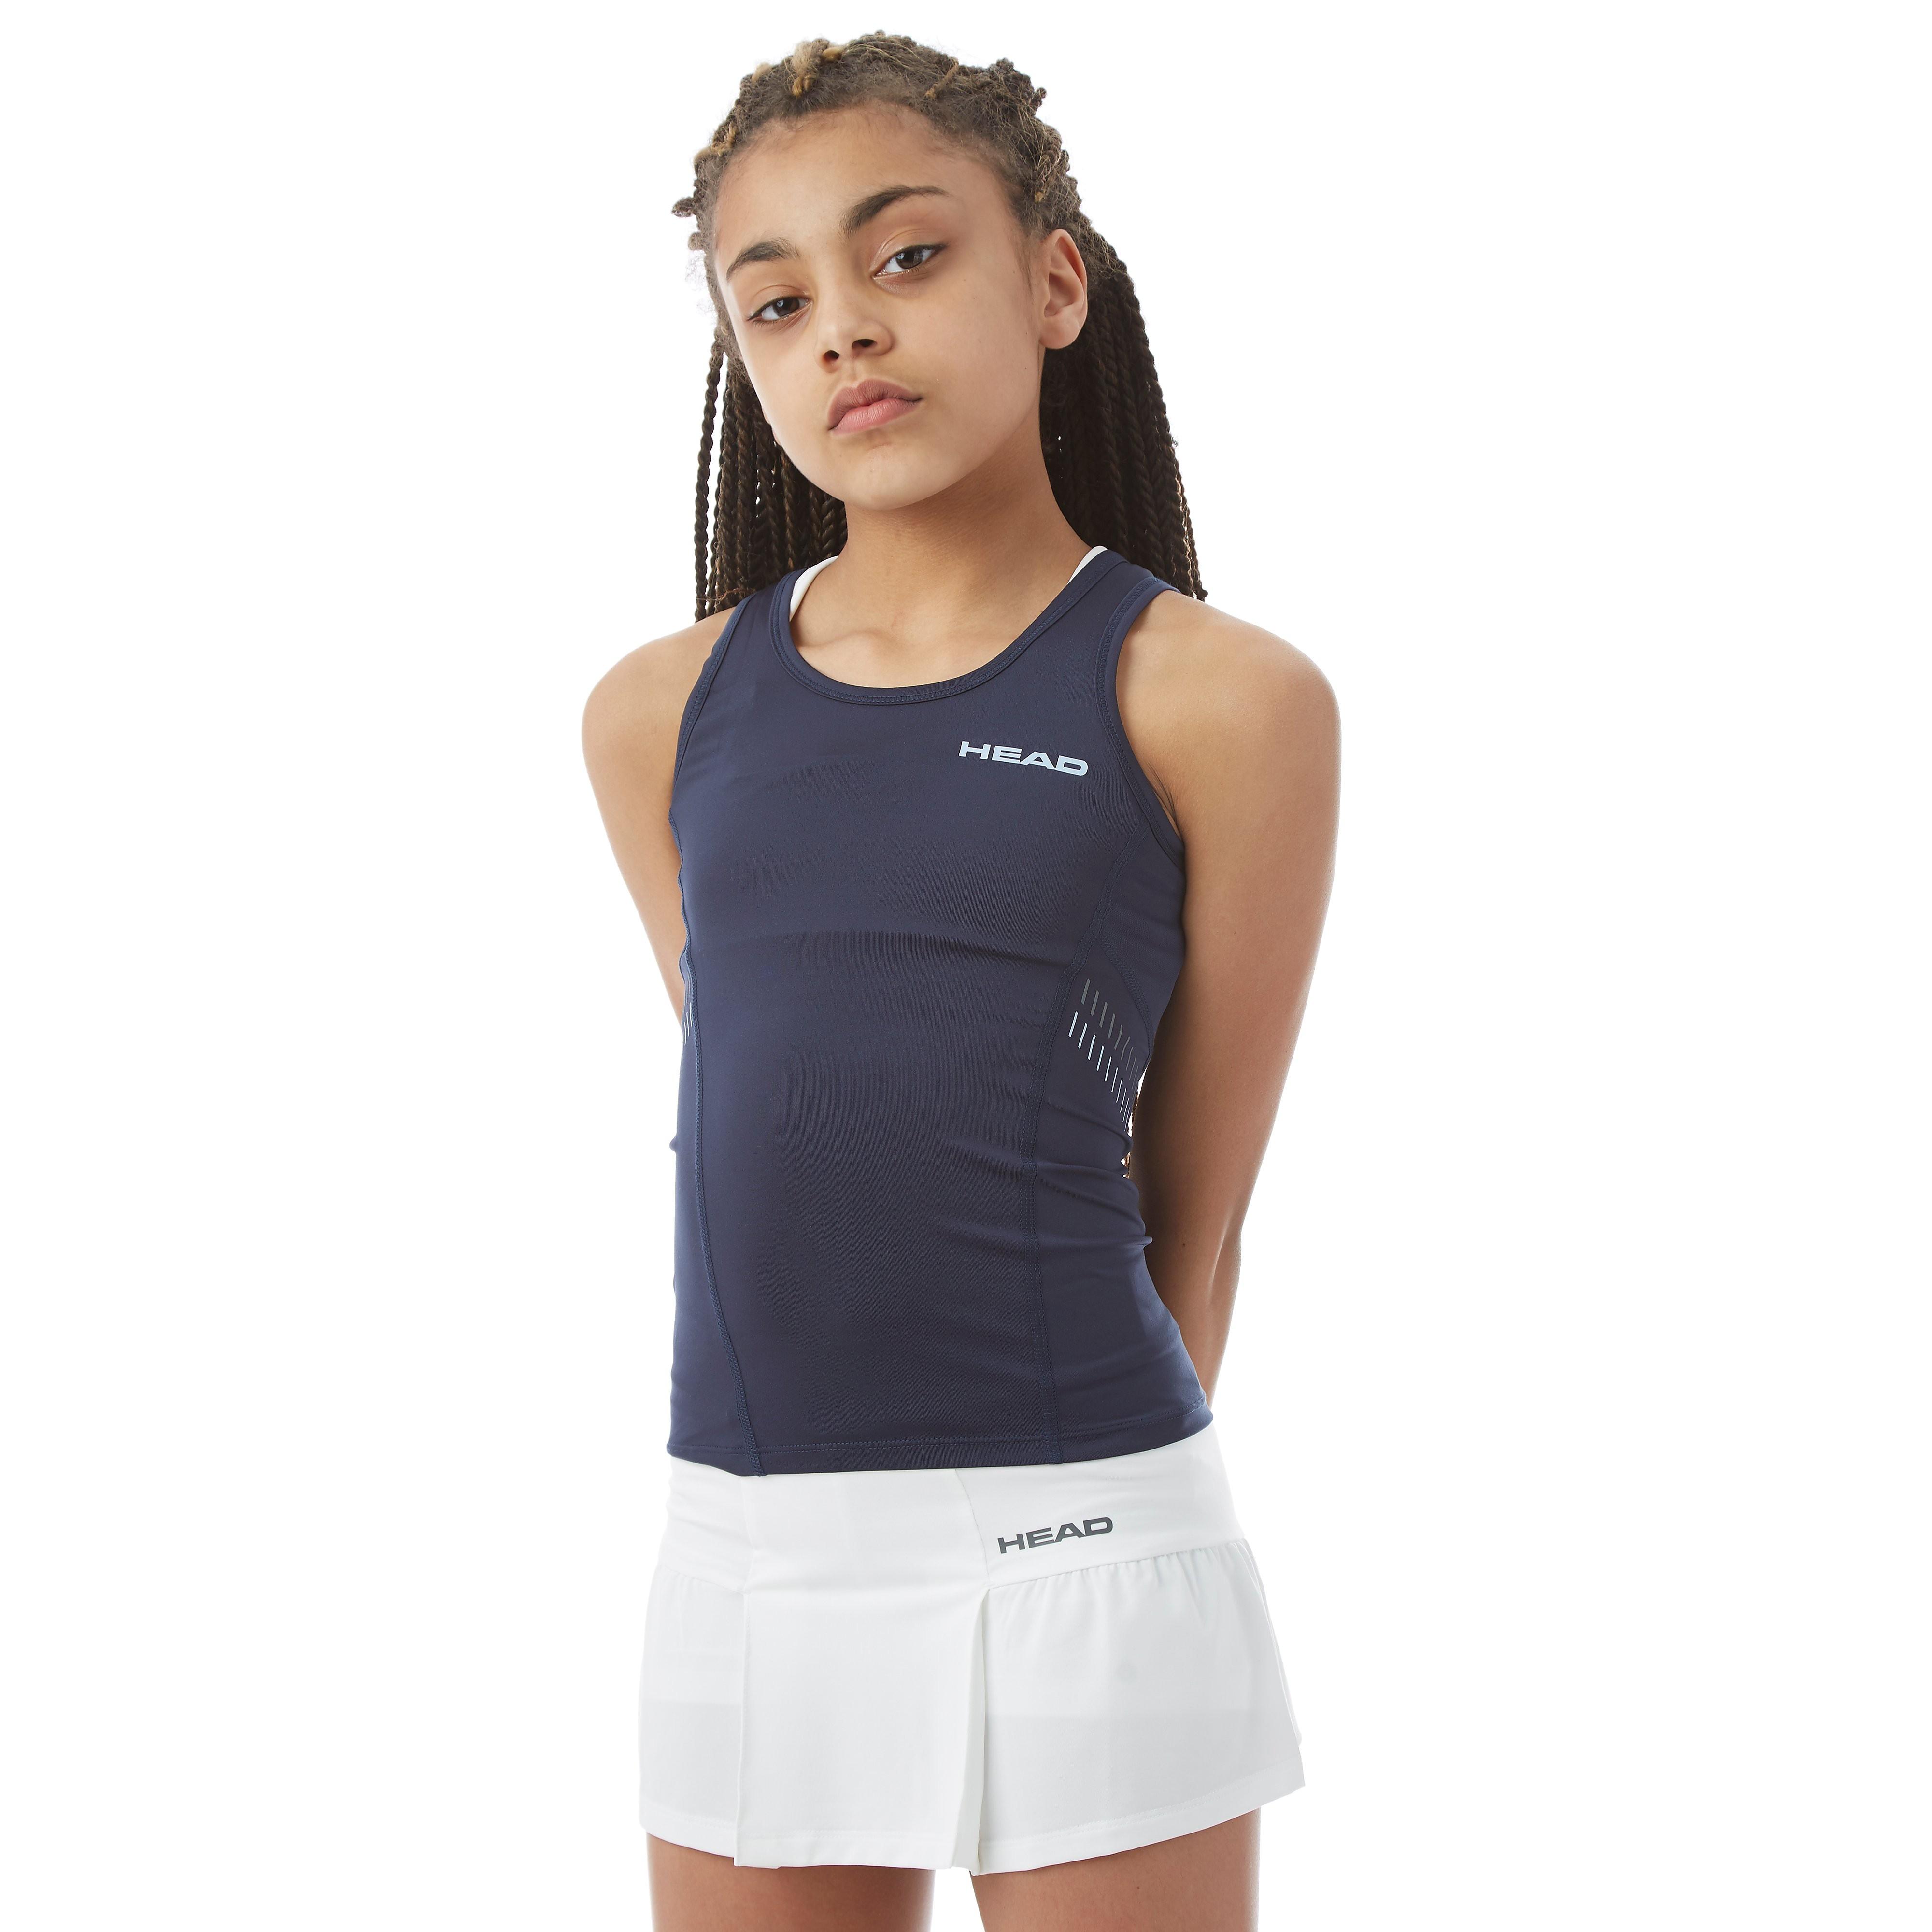 Head Club Tank Junior Tennis Top